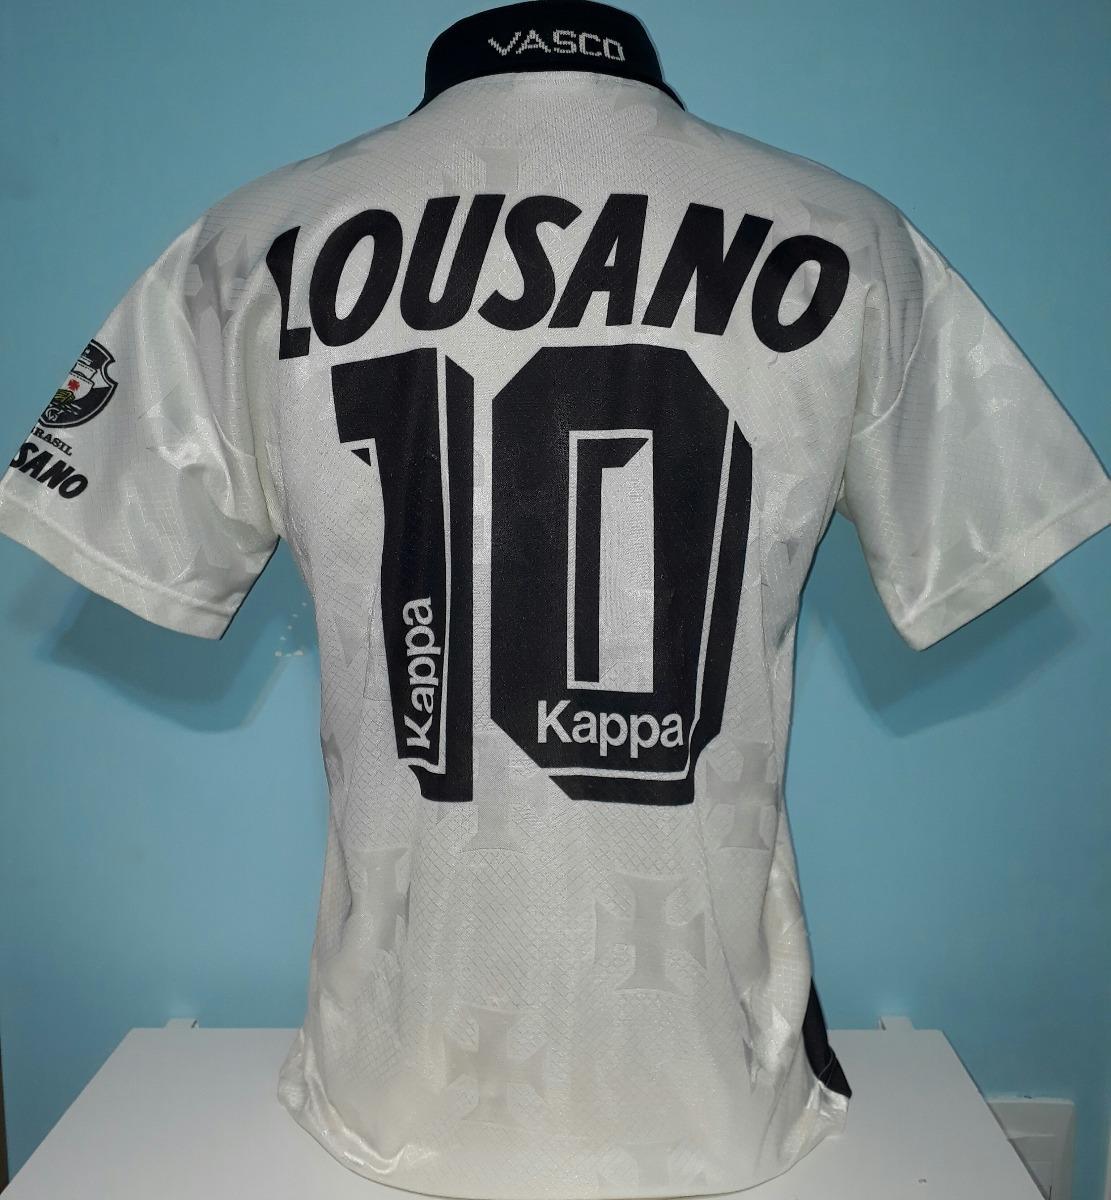 camisa vasco antiga lousano 1996 original kappa - 88. Carregando zoom. f2e9c56324b72